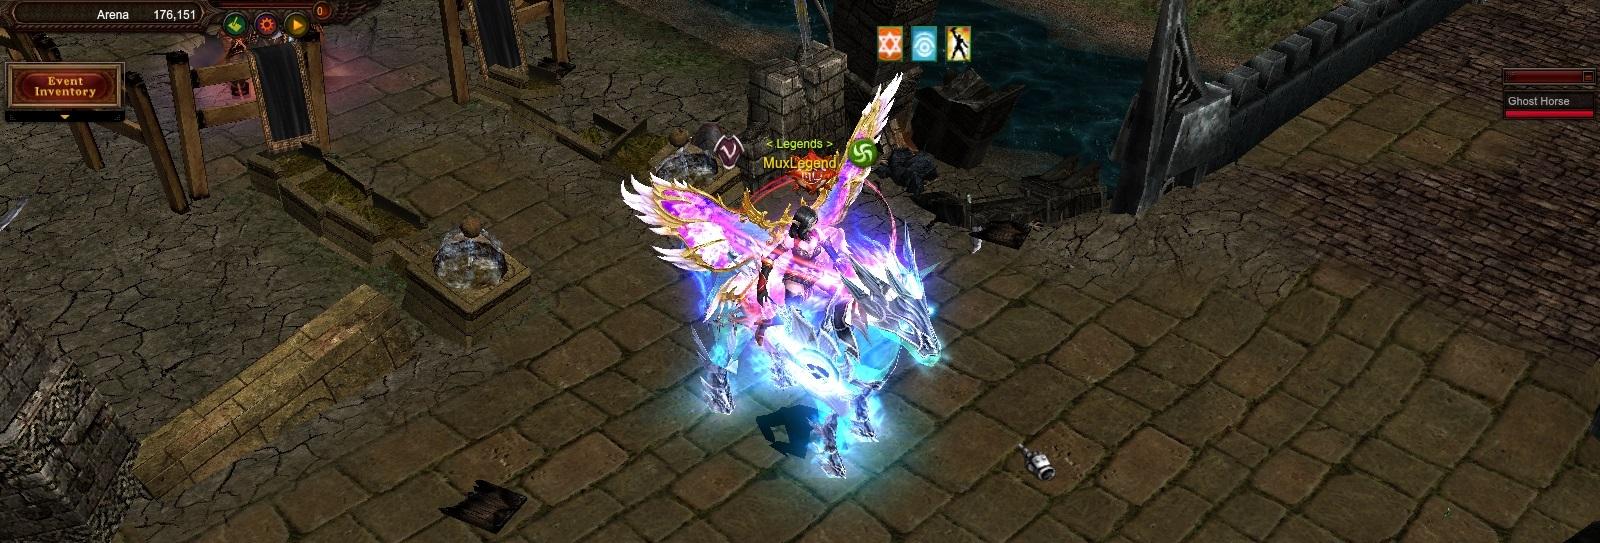 Ghost Horse MU Online